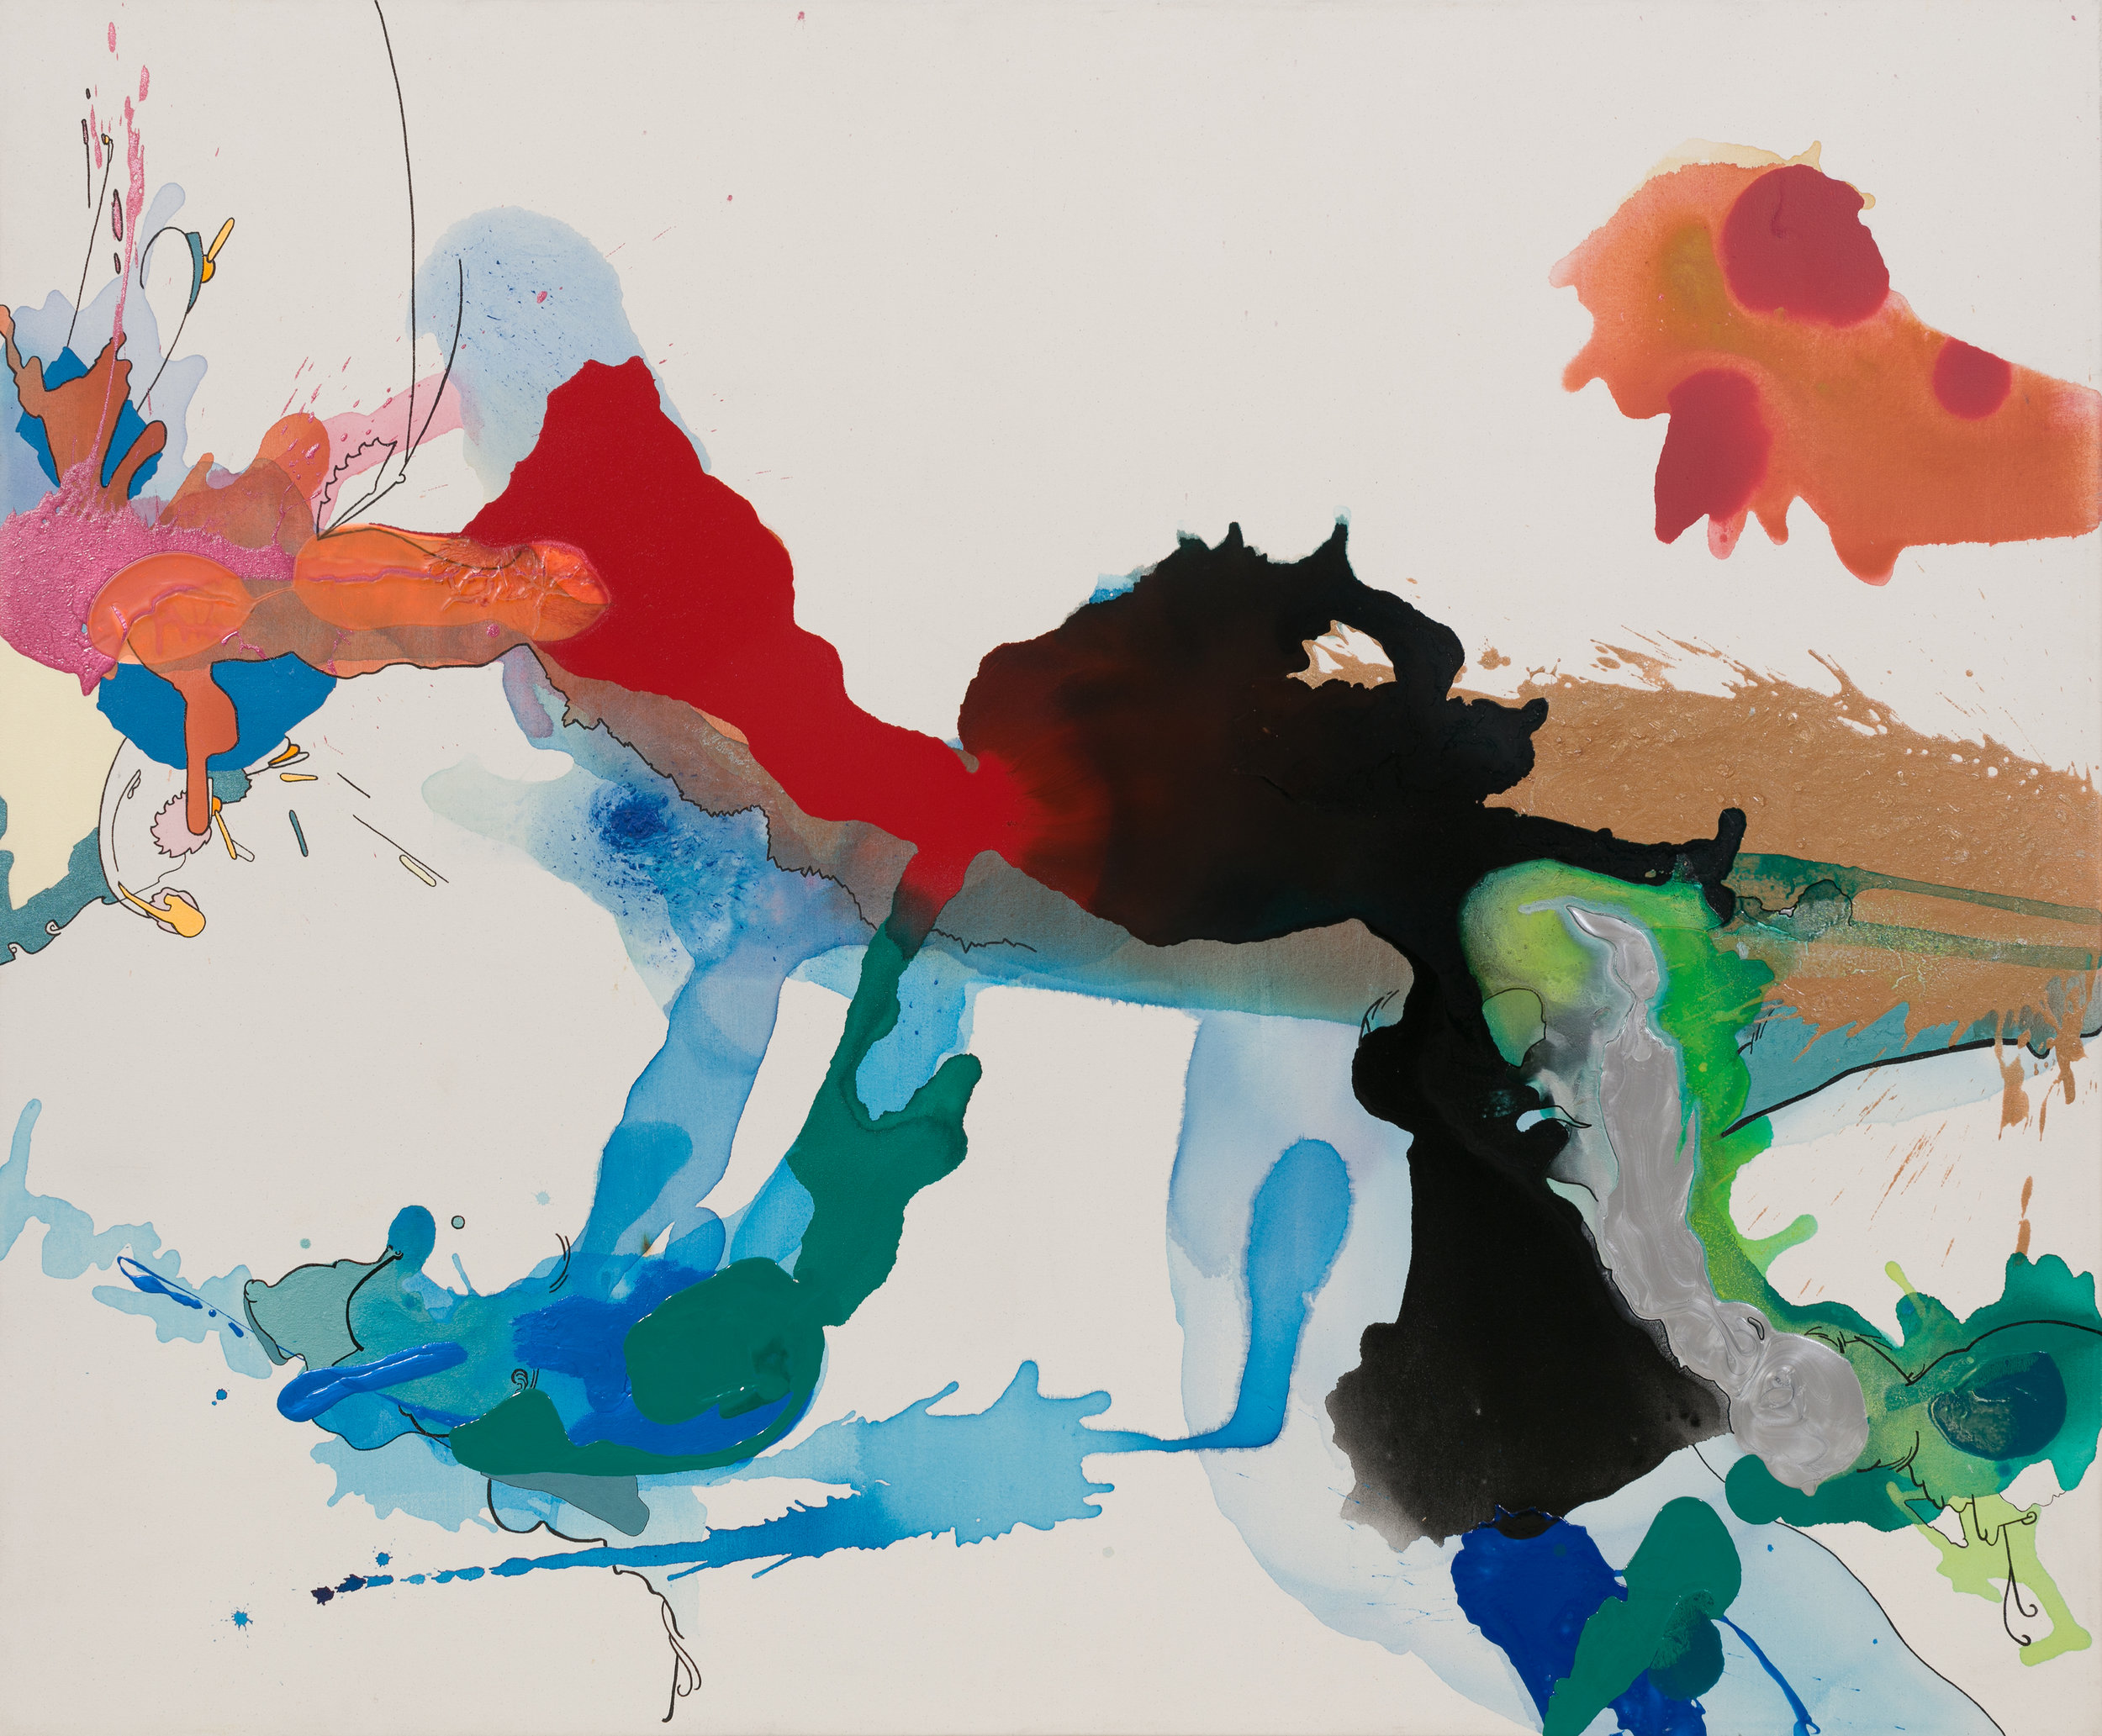 "A Blackhole's Resistance , 2008   60 x 72 x 3""  Acrylic, enamel, and marker on raw canvas"